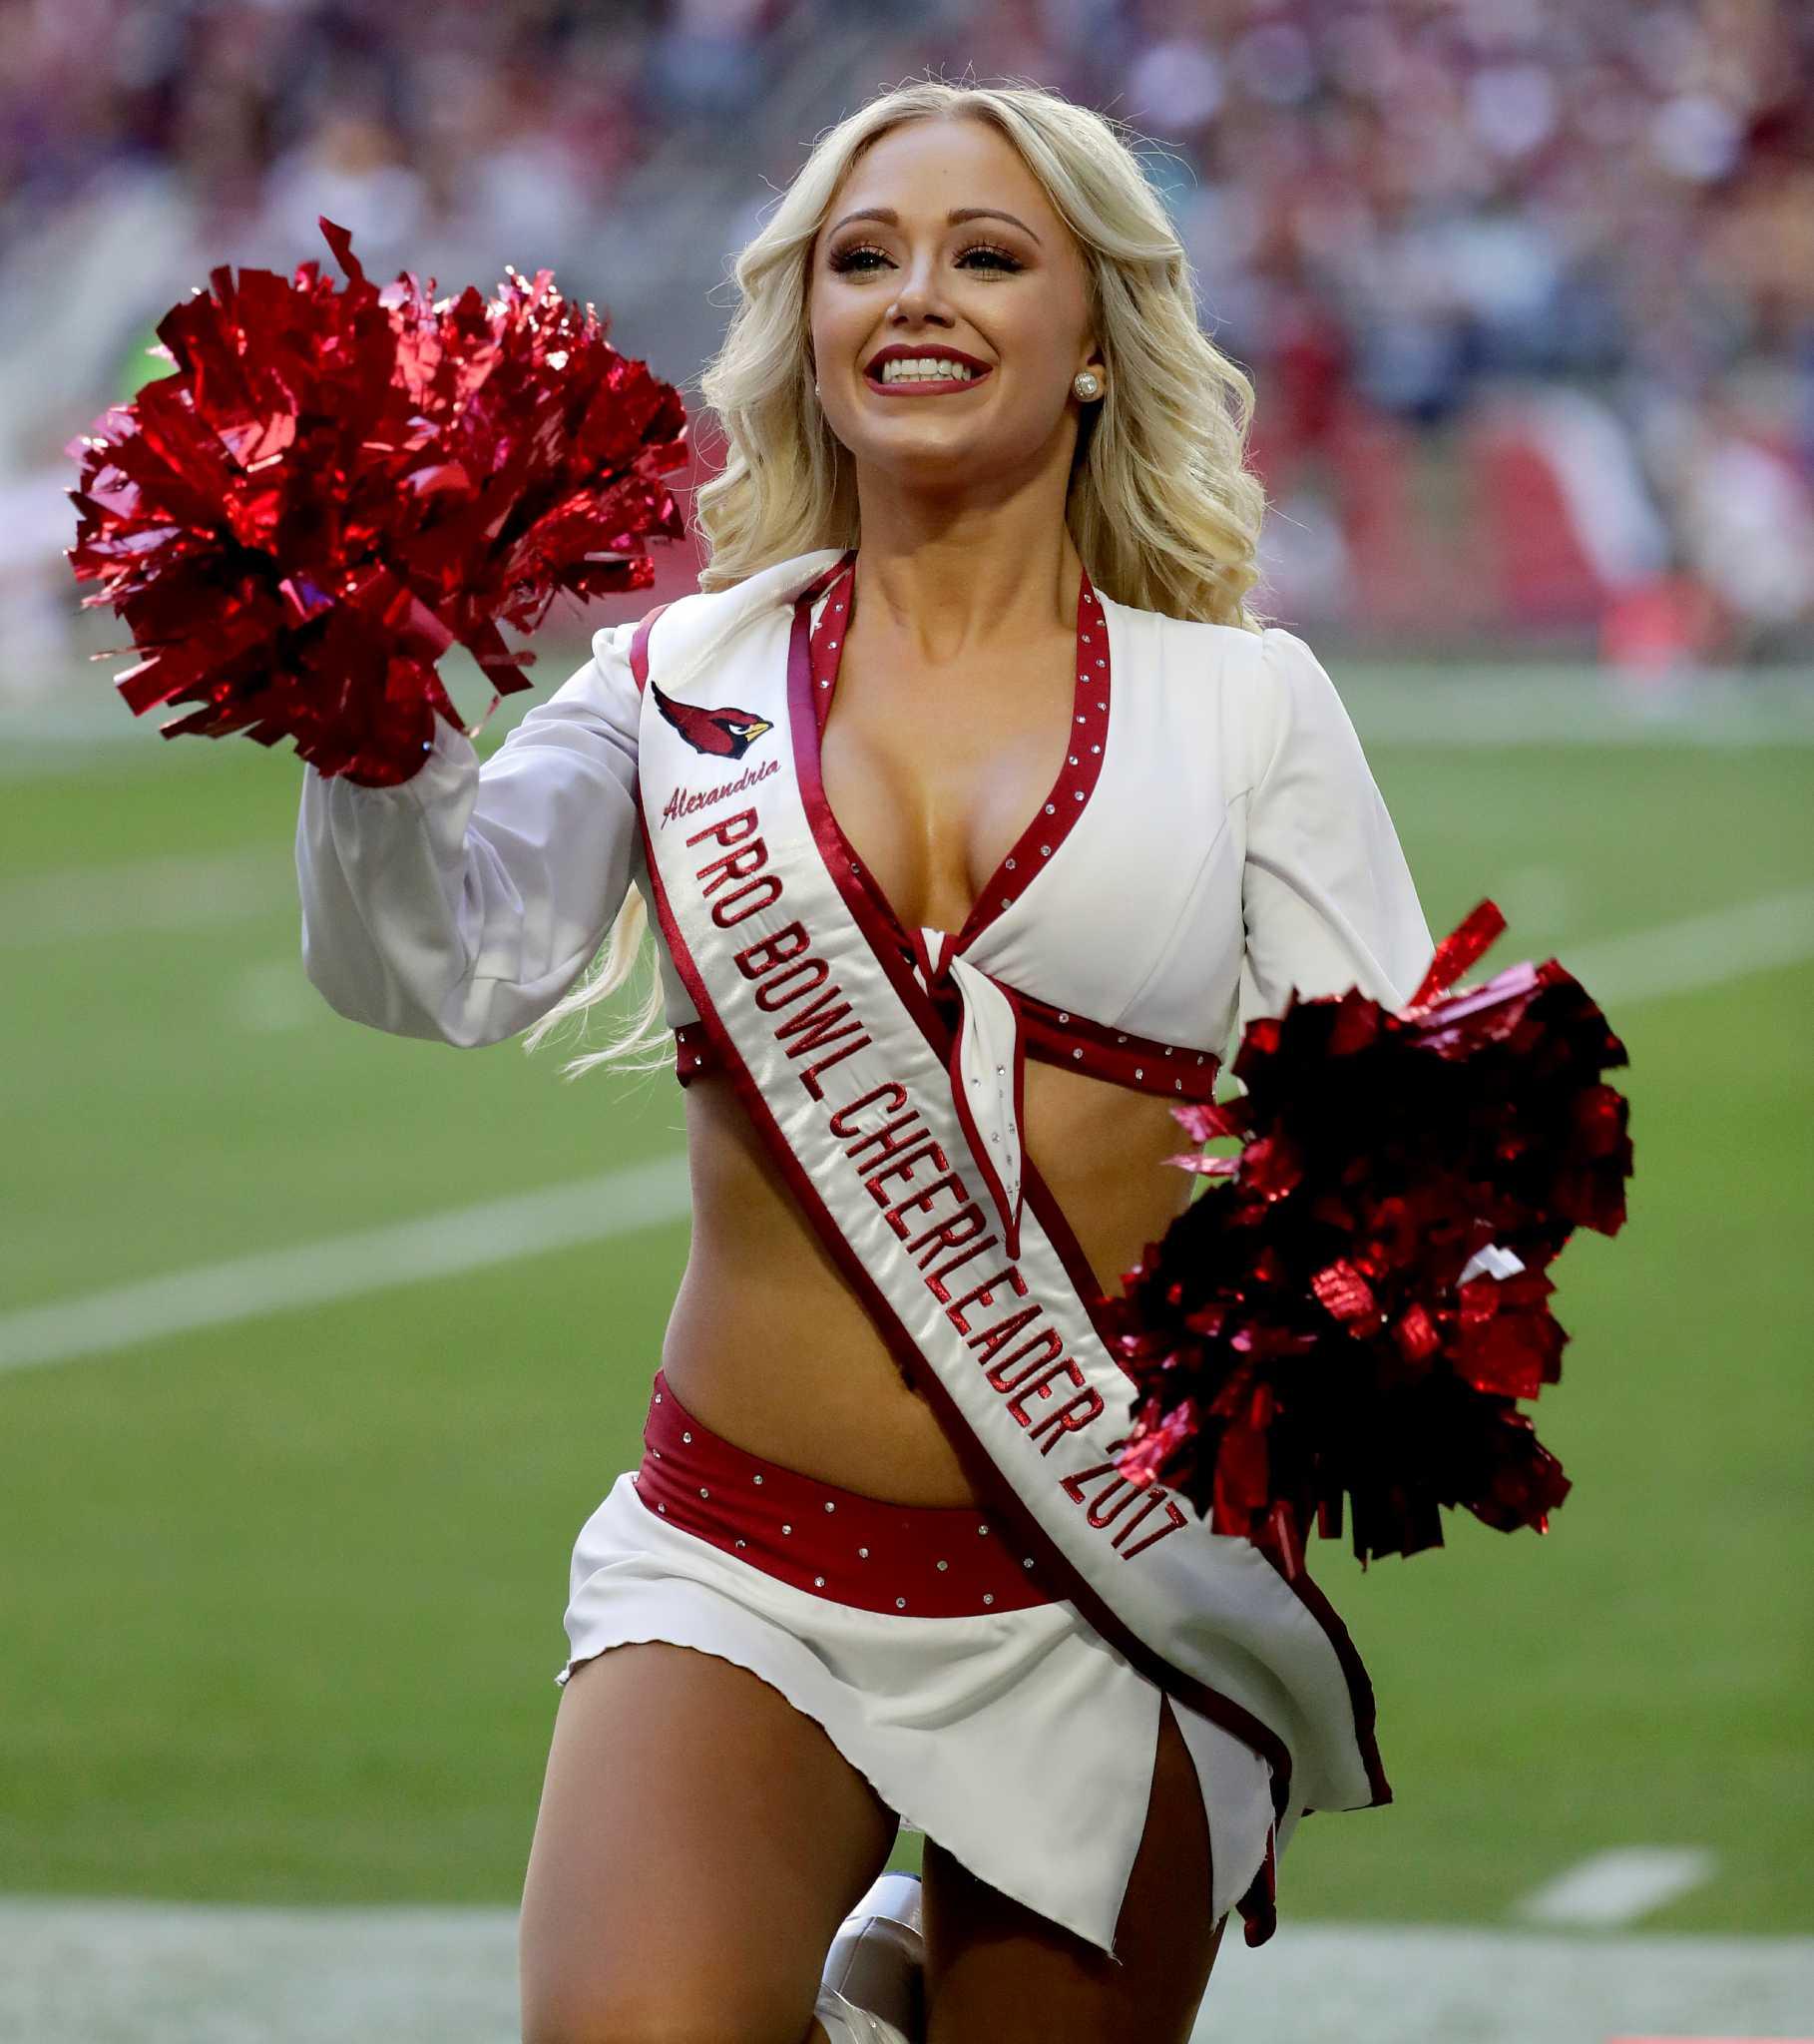 pro football cheerleader